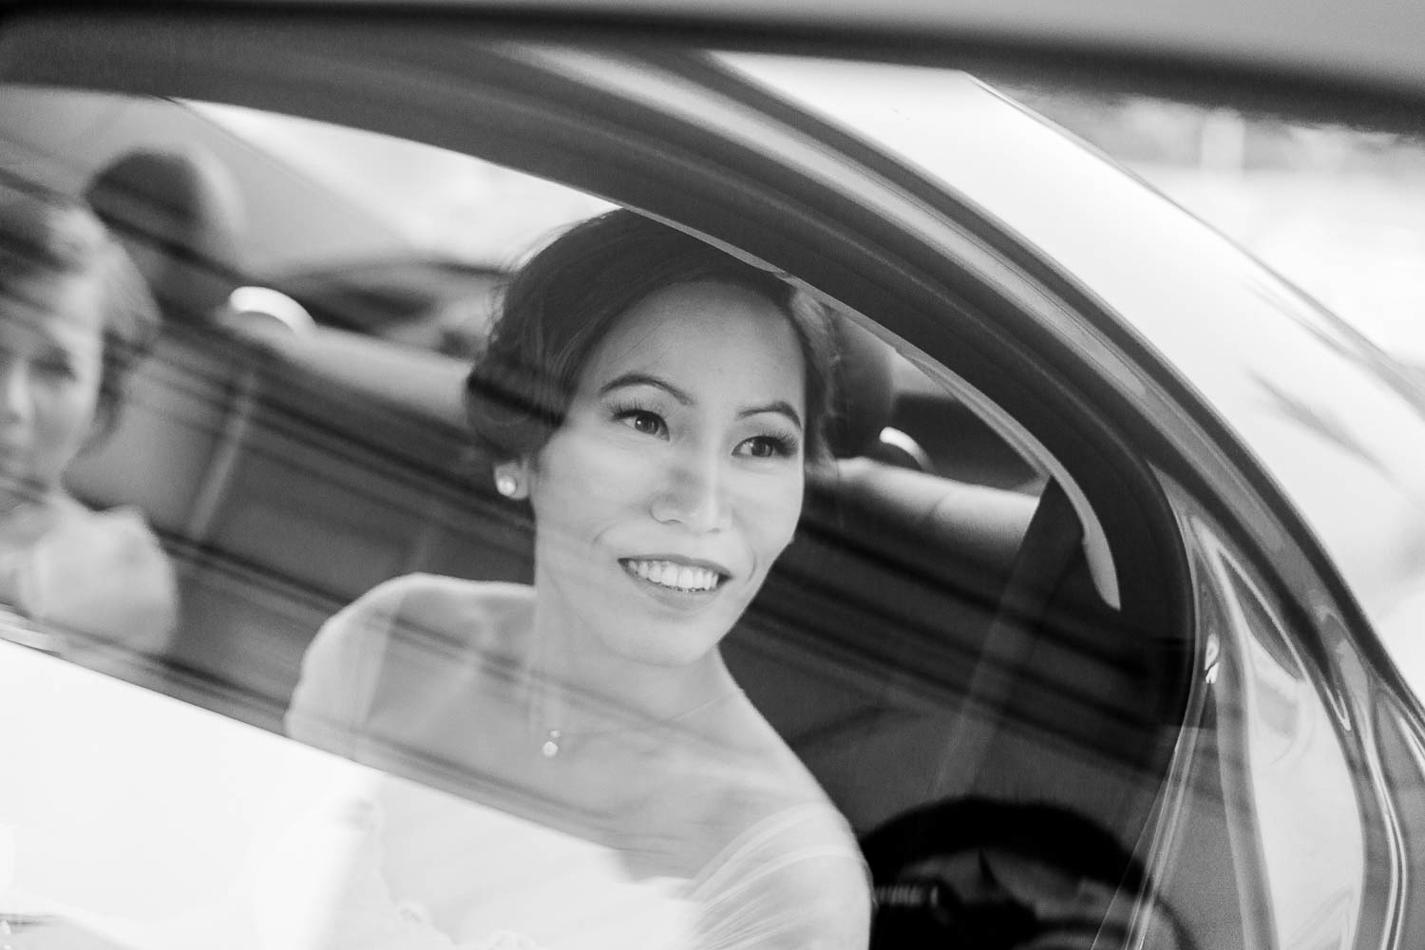 wedding-photographer-singapore-film-photographer-chen-sands-Anglea-wedding-CSPBLOG-5.jpg